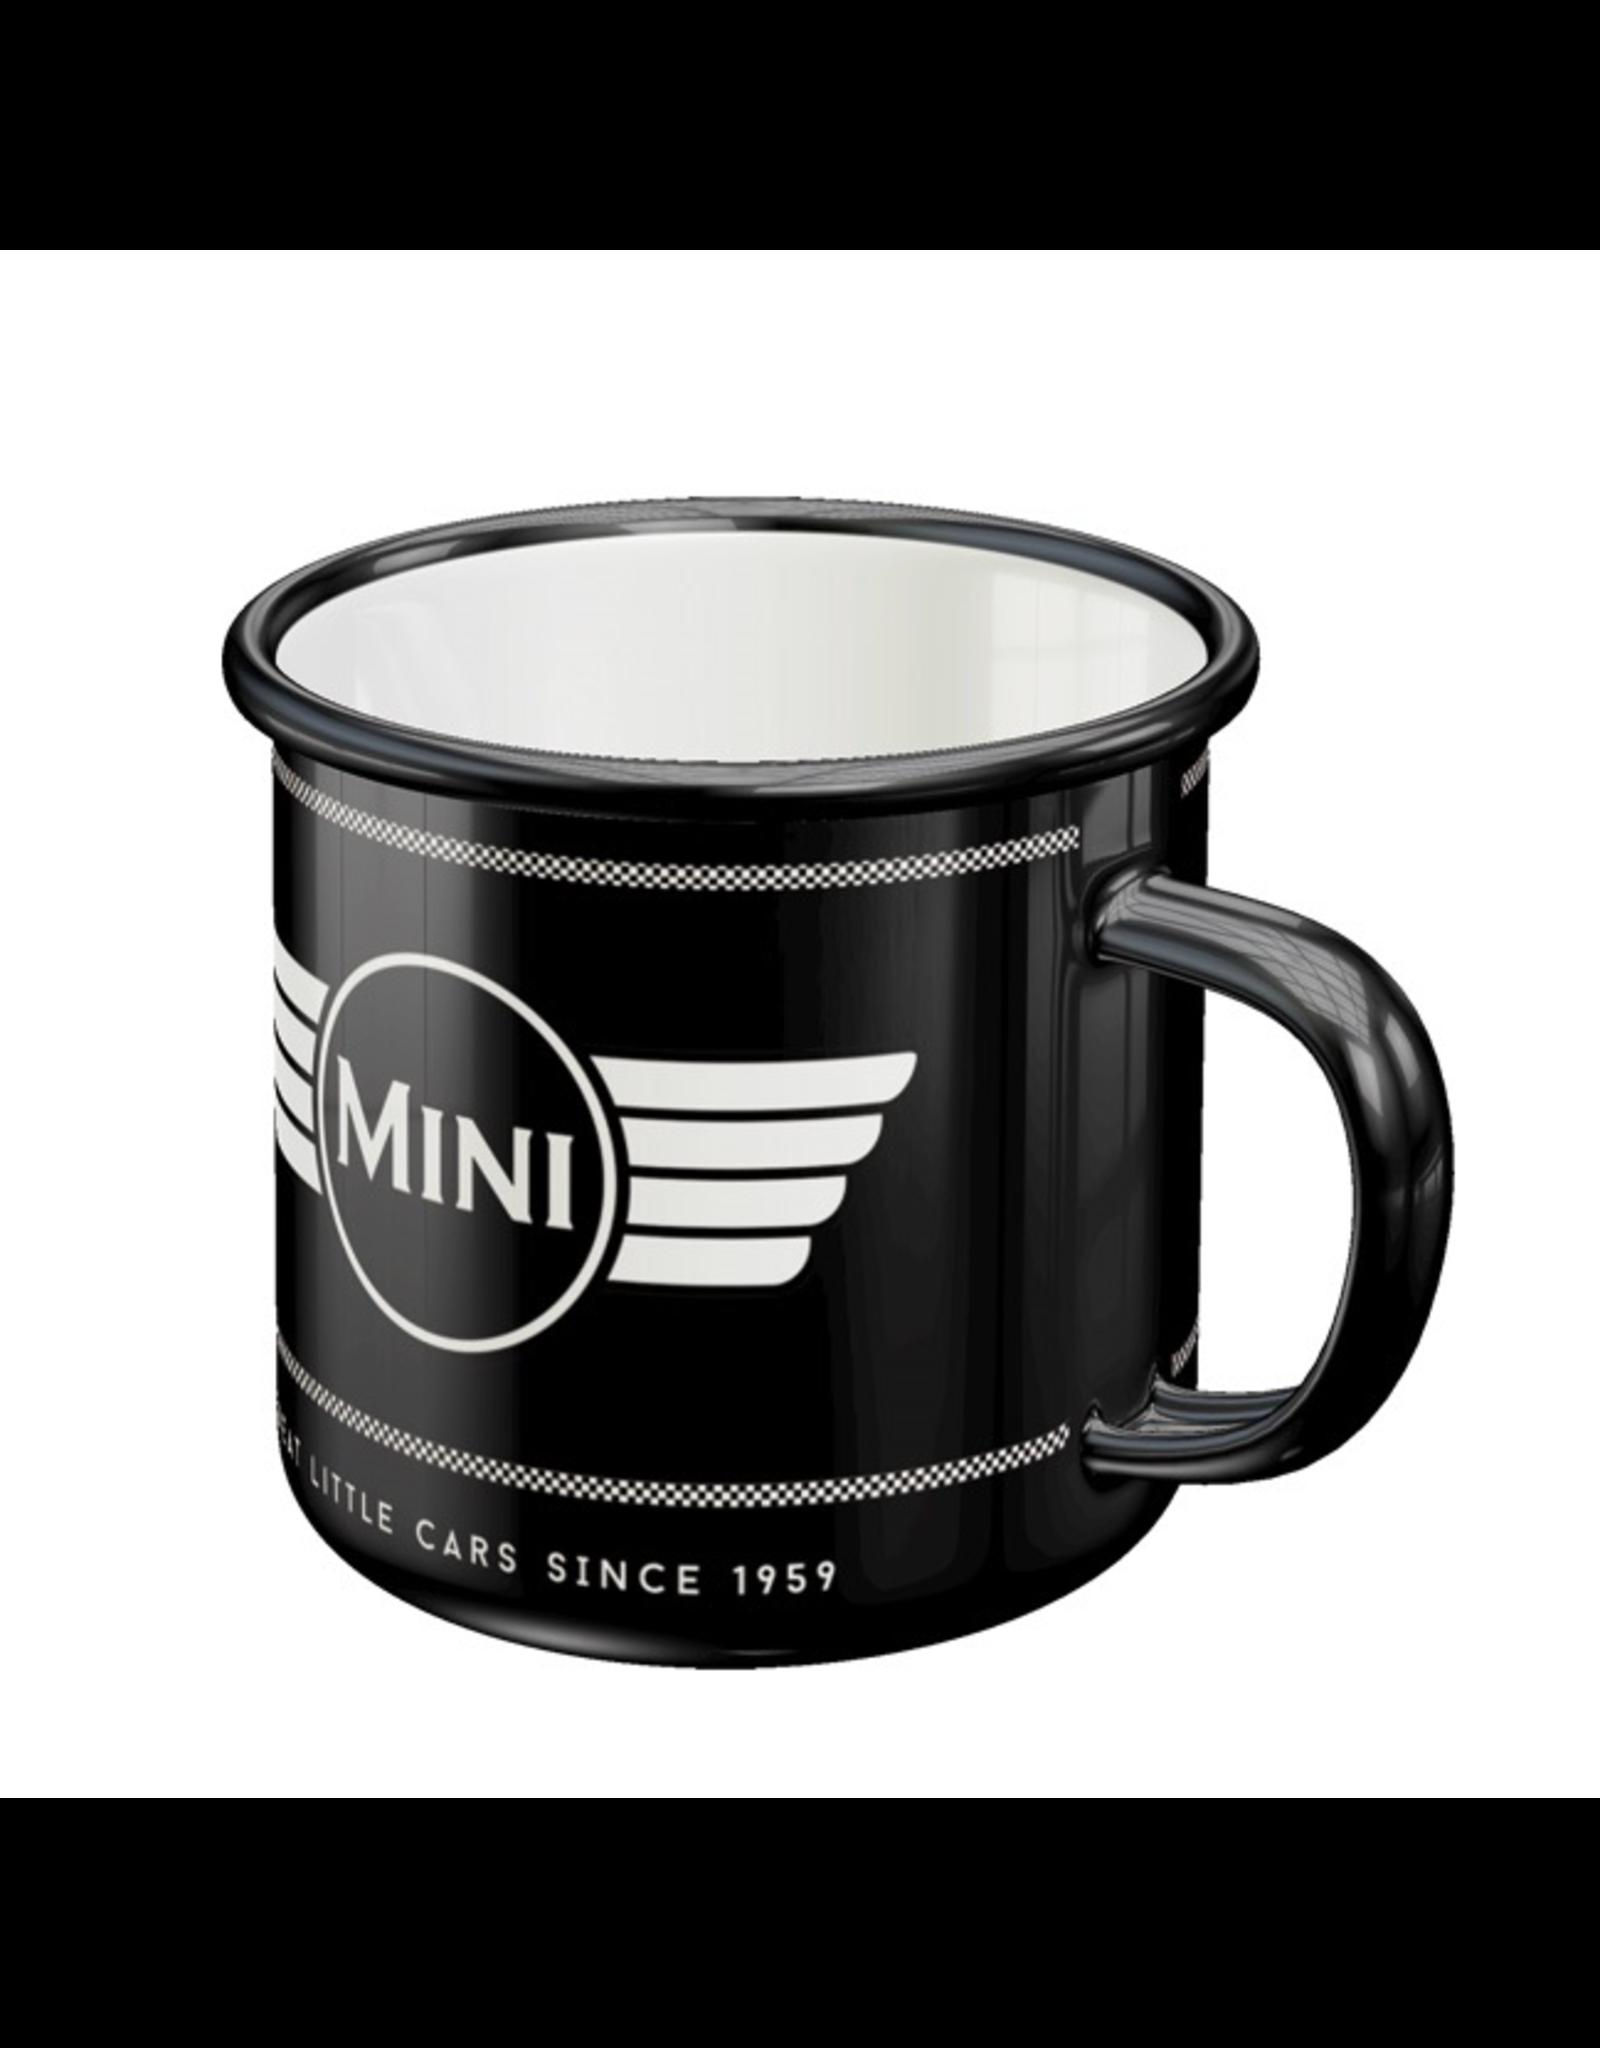 enamel mug - mini